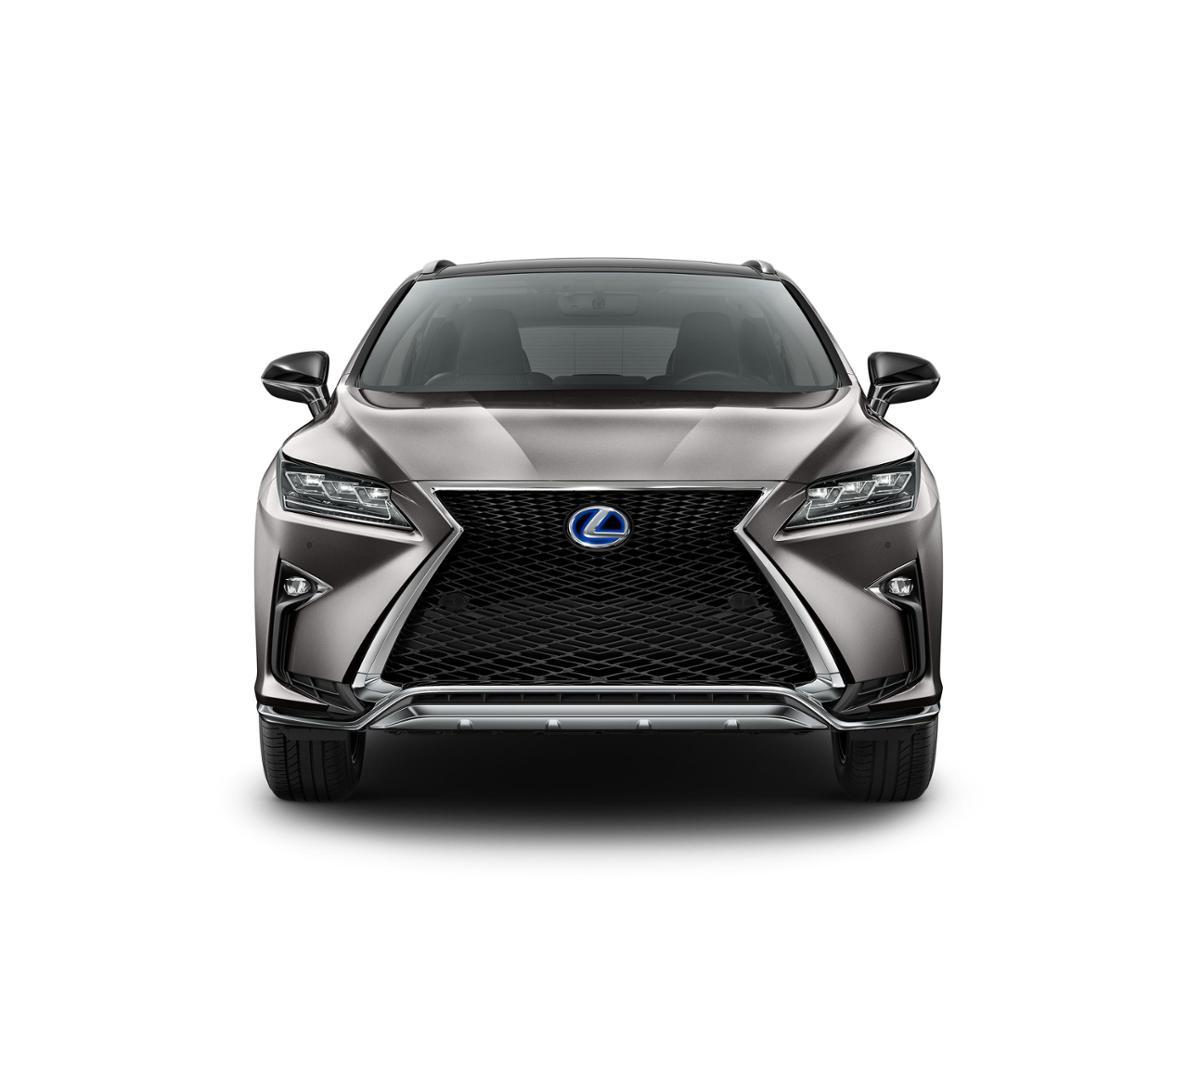 2019 Lexus Rx Hybrid: 2019 Lexus RX 450h For Sale In San Jose